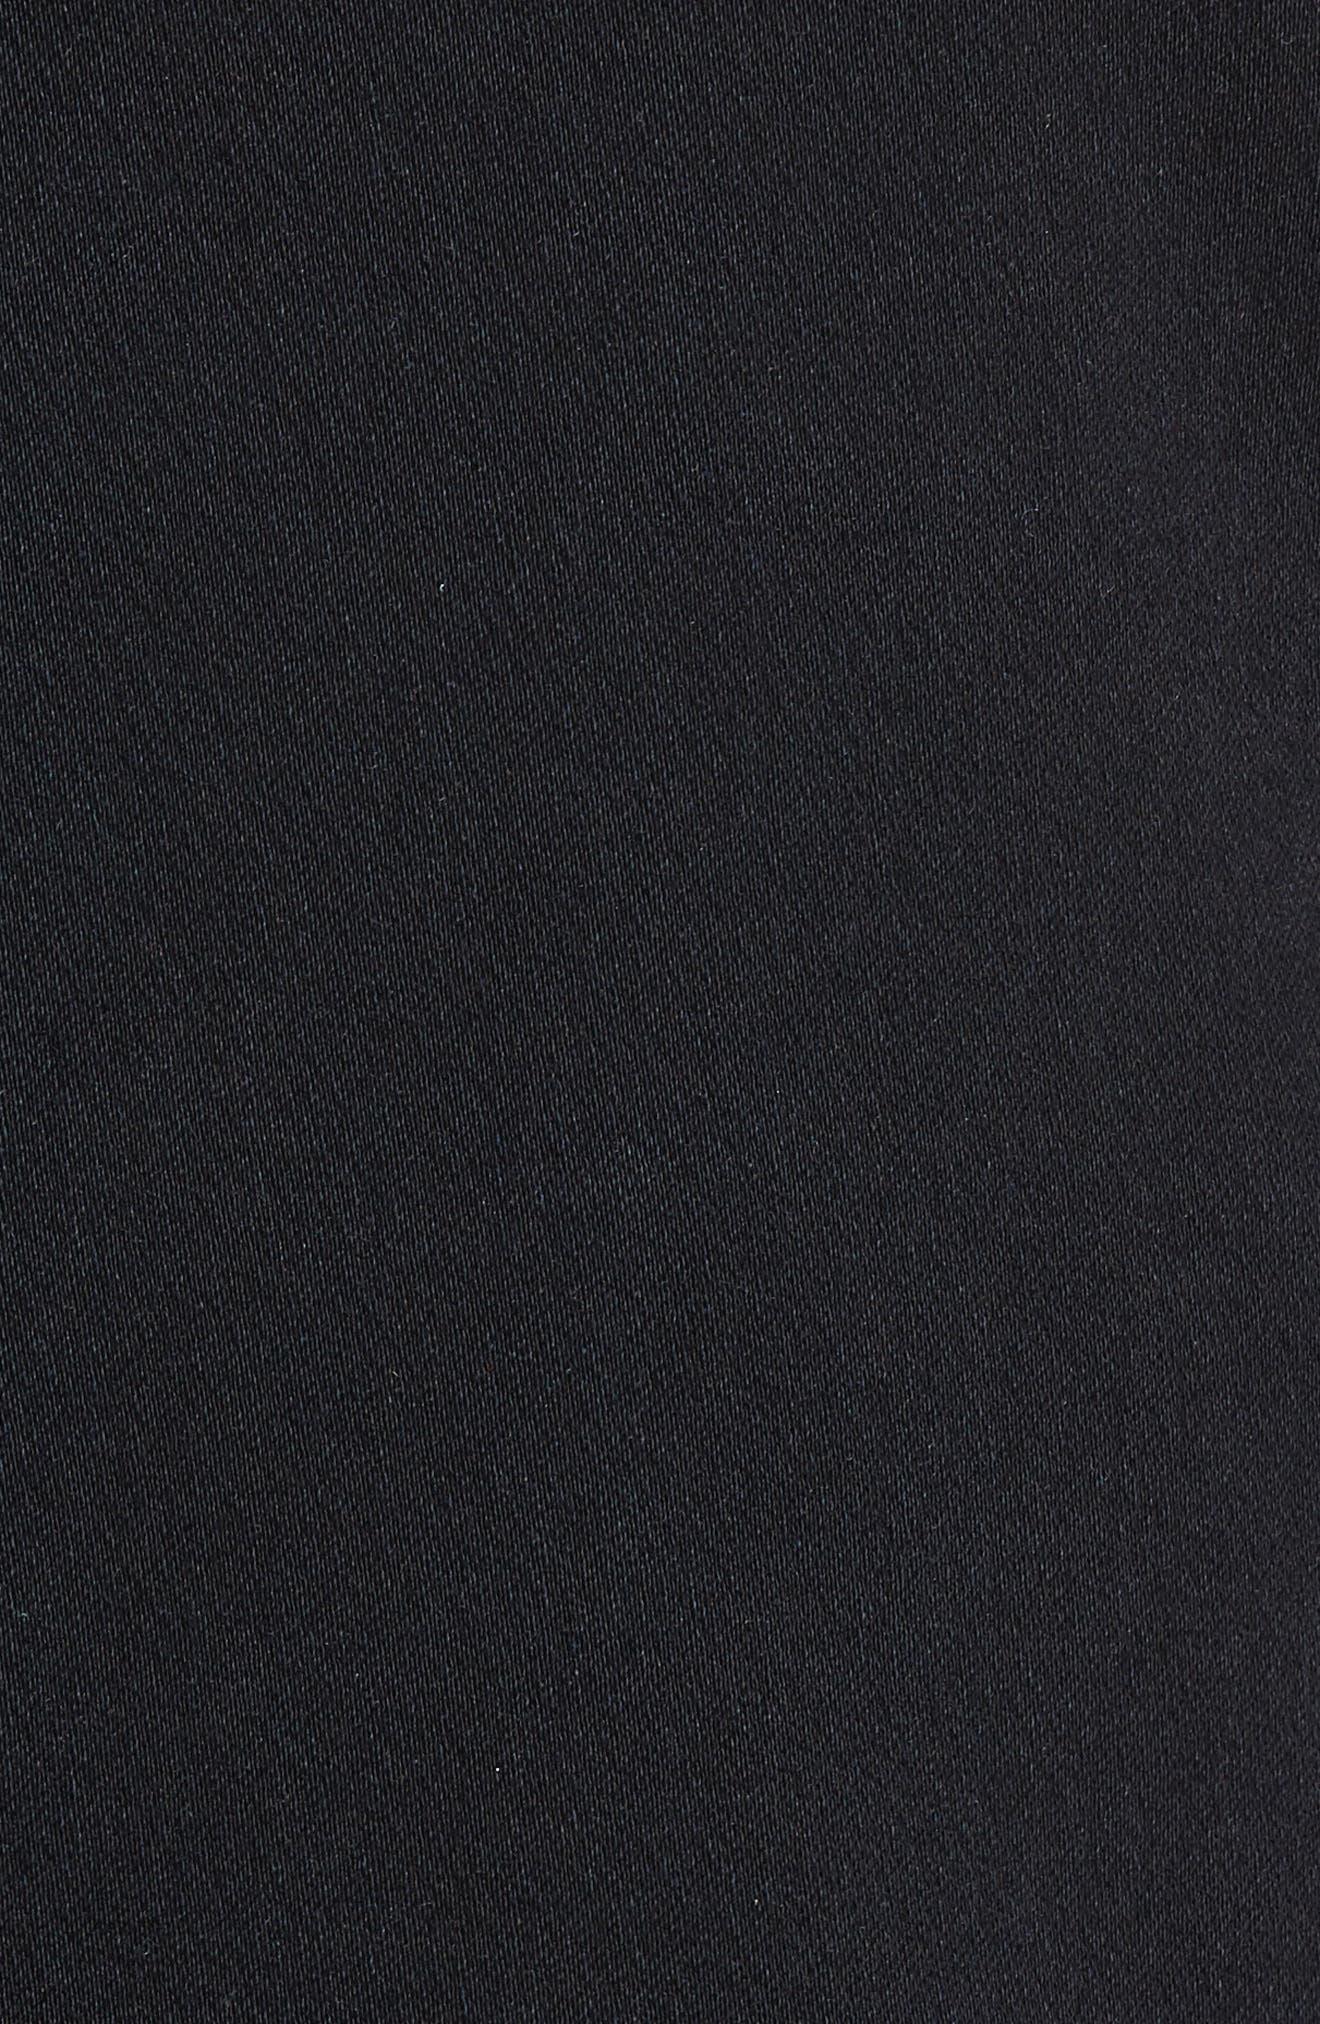 Overdyed Bomber Jacket,                             Alternate thumbnail 6, color,